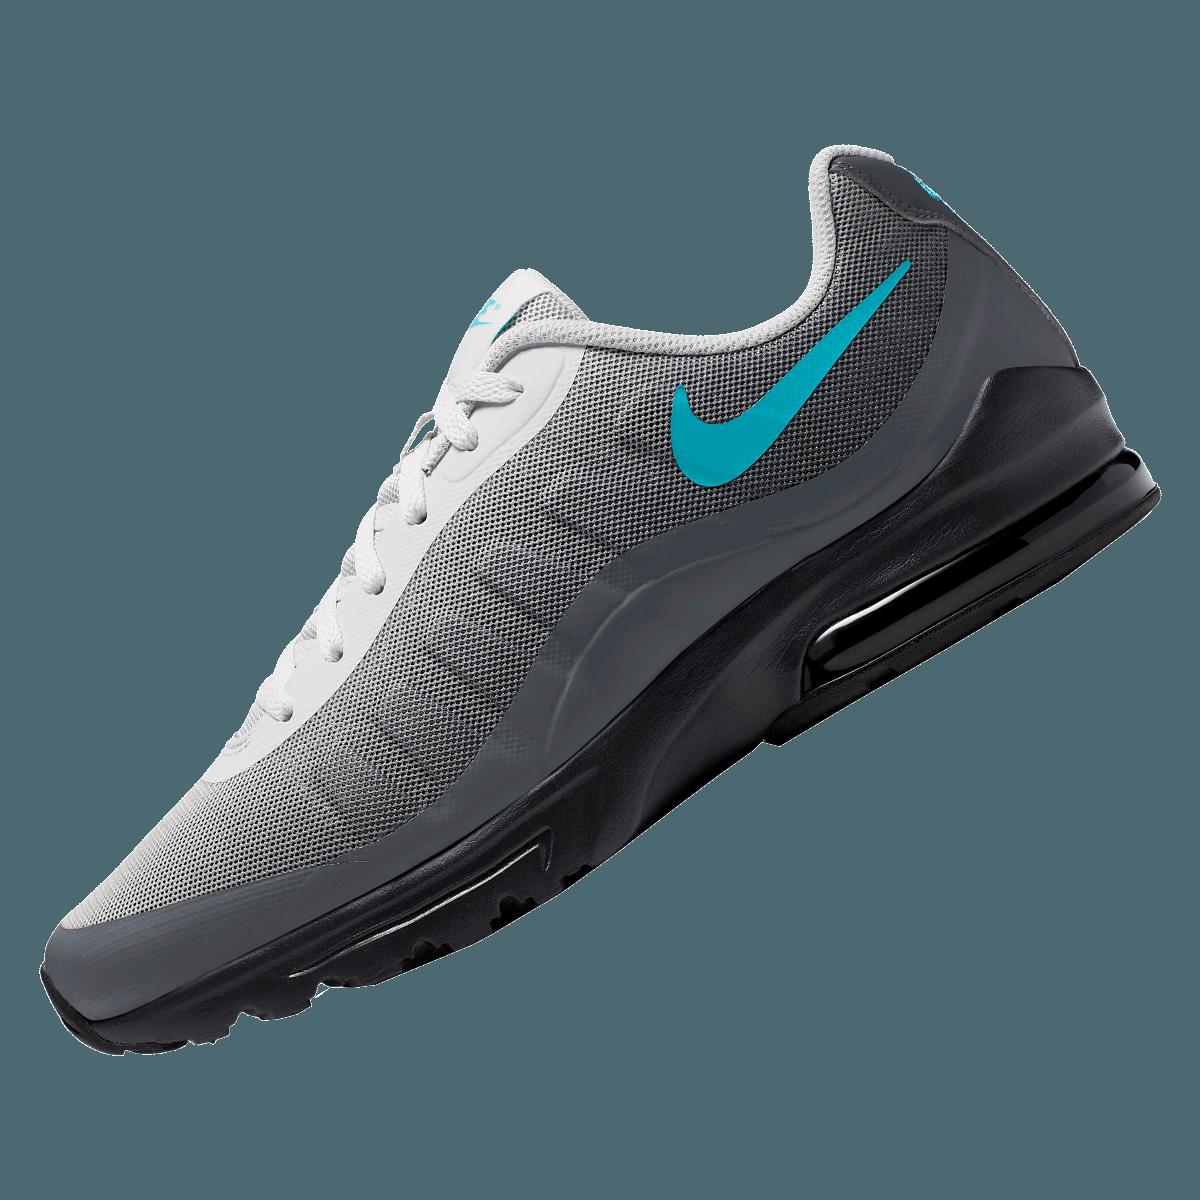 Nike hardloopschoenen Air Max Invigor donkergrijsturquoise